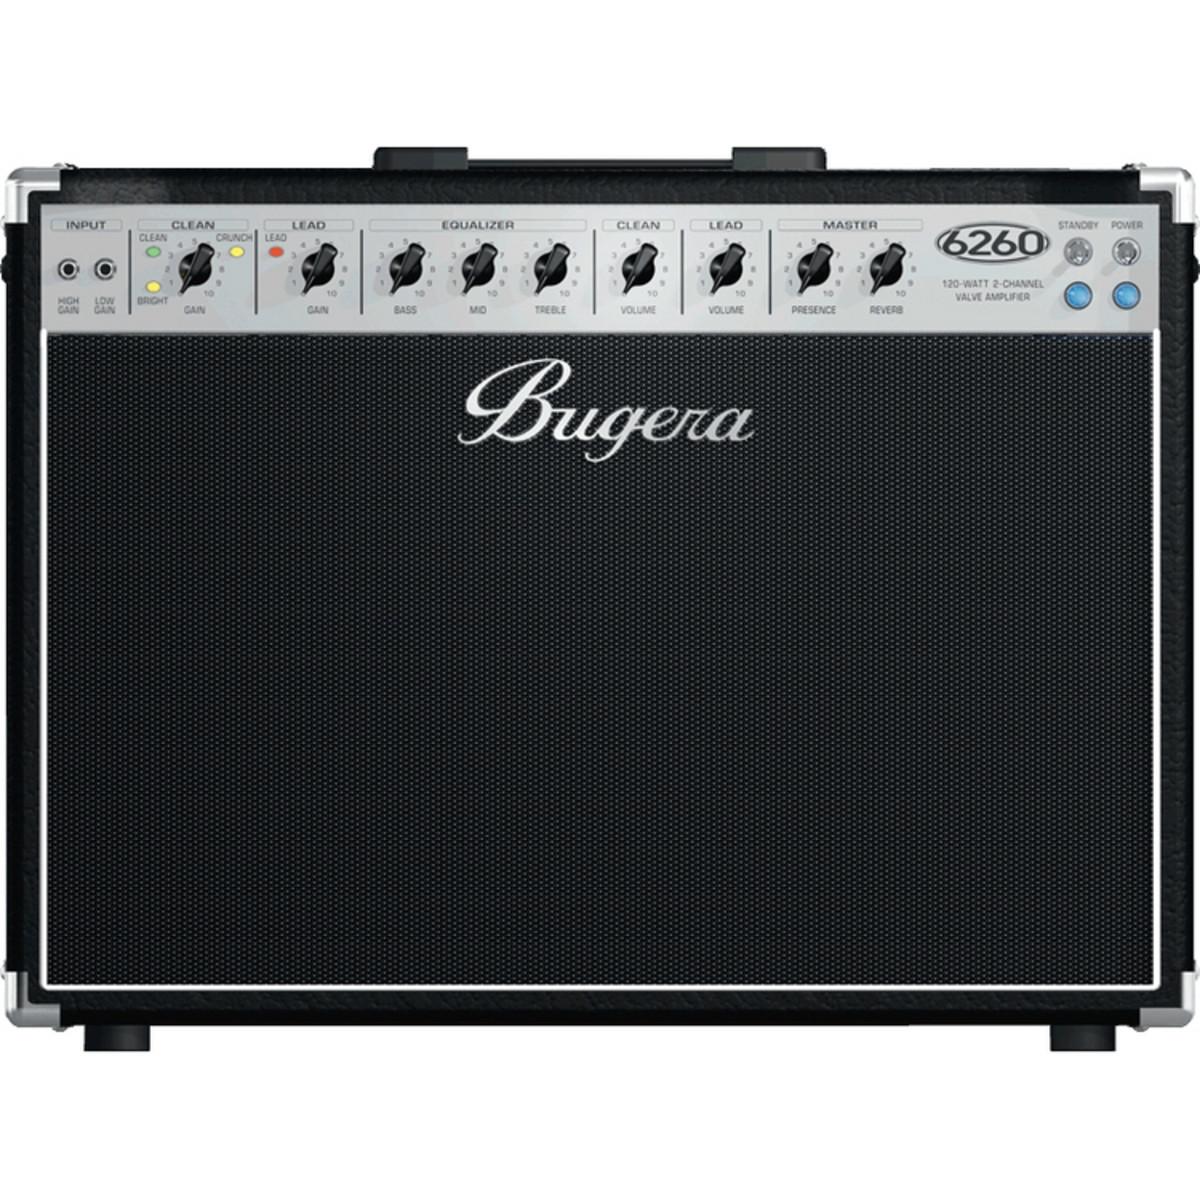 disc bugera 6260 212 120w guitar combo amp at gear4music. Black Bedroom Furniture Sets. Home Design Ideas